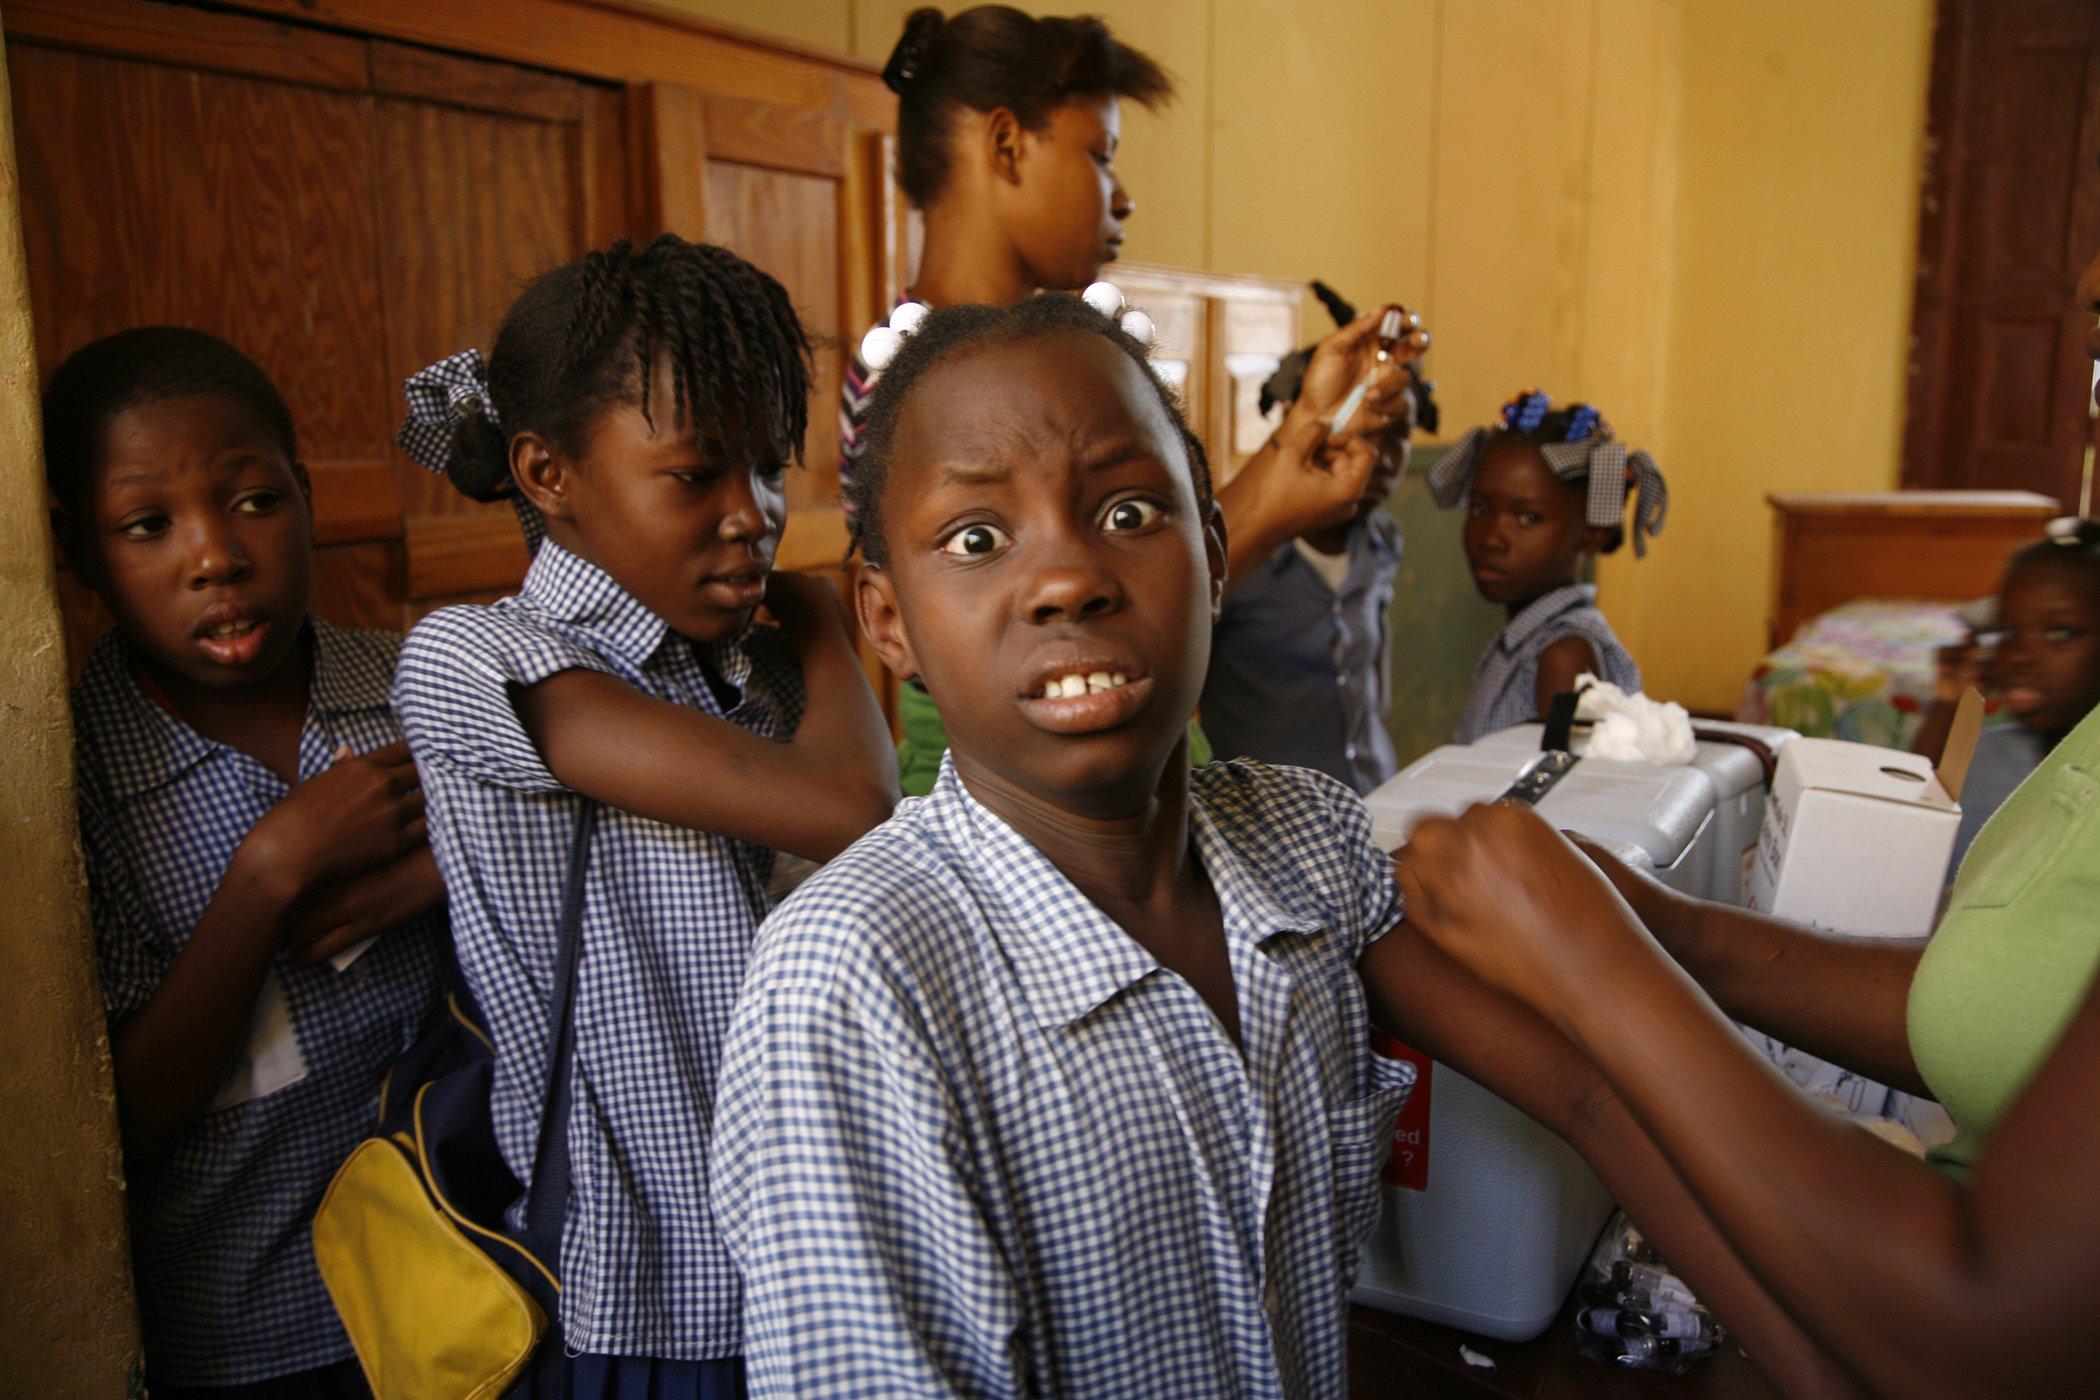 UNICEF_Vaccinations-Around-The-World_008.JPG